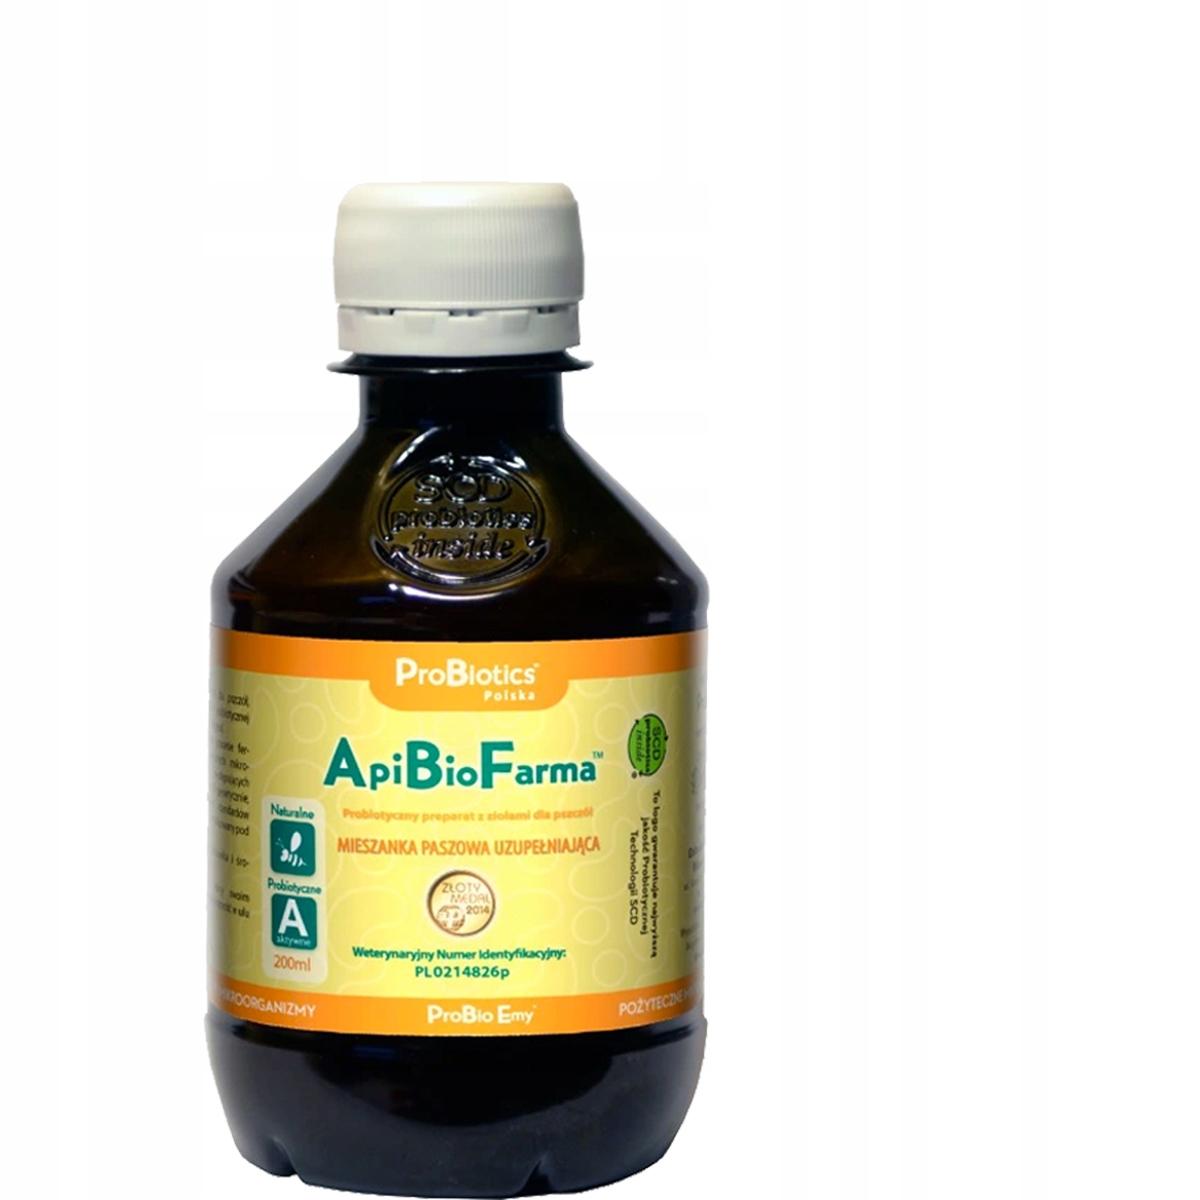 SUPER Probiotyk WZMACNIA pszczoły ApiBioFarma 0,2L